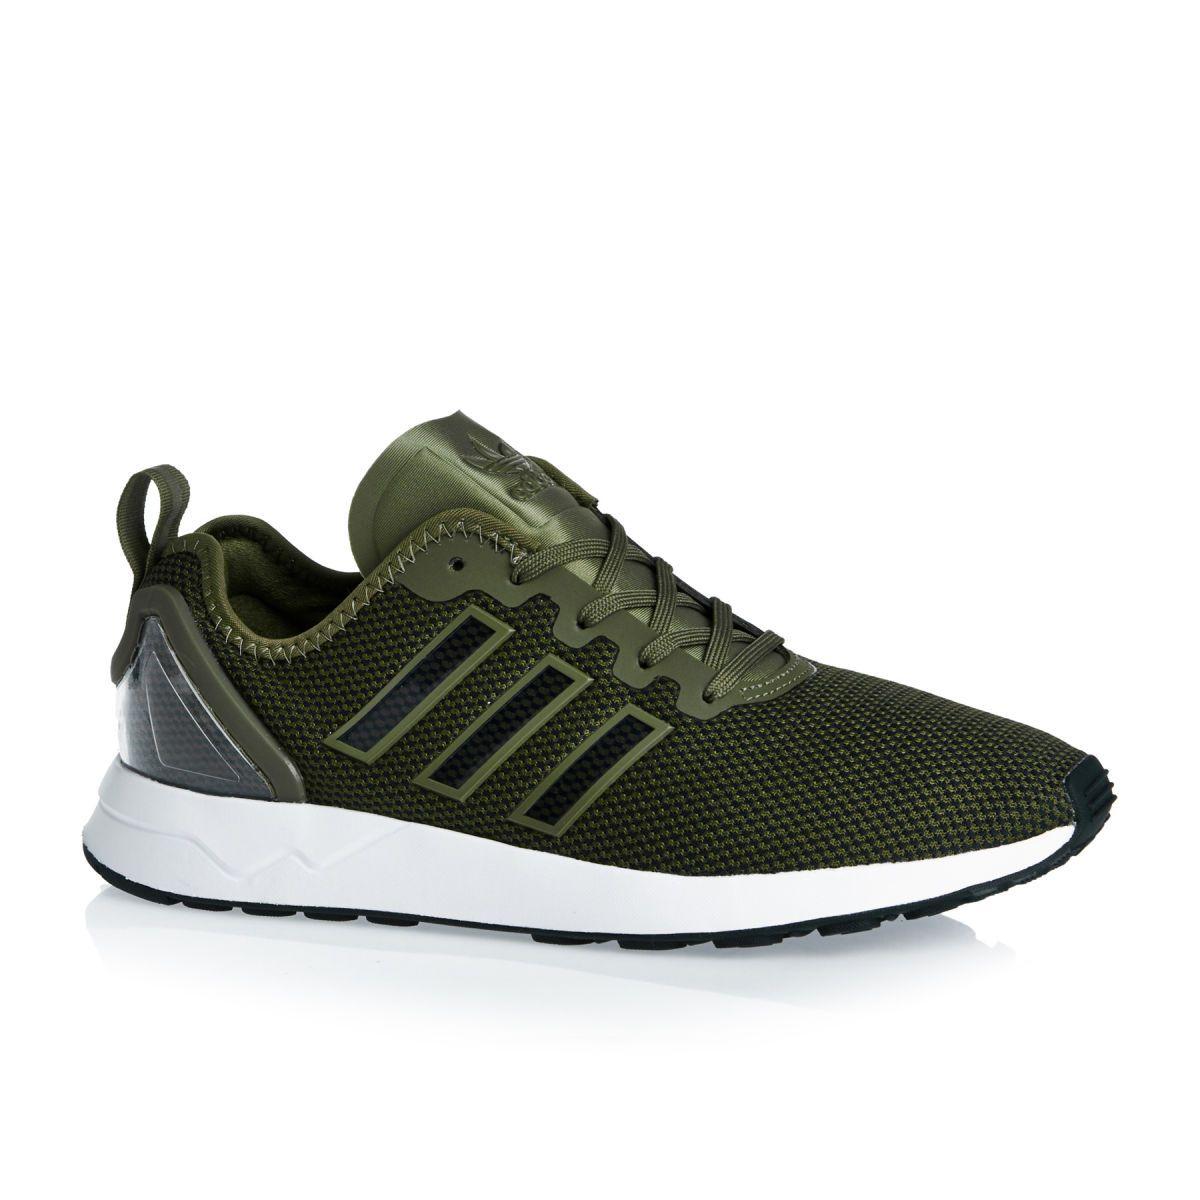 adidas zx flux racer schoenen